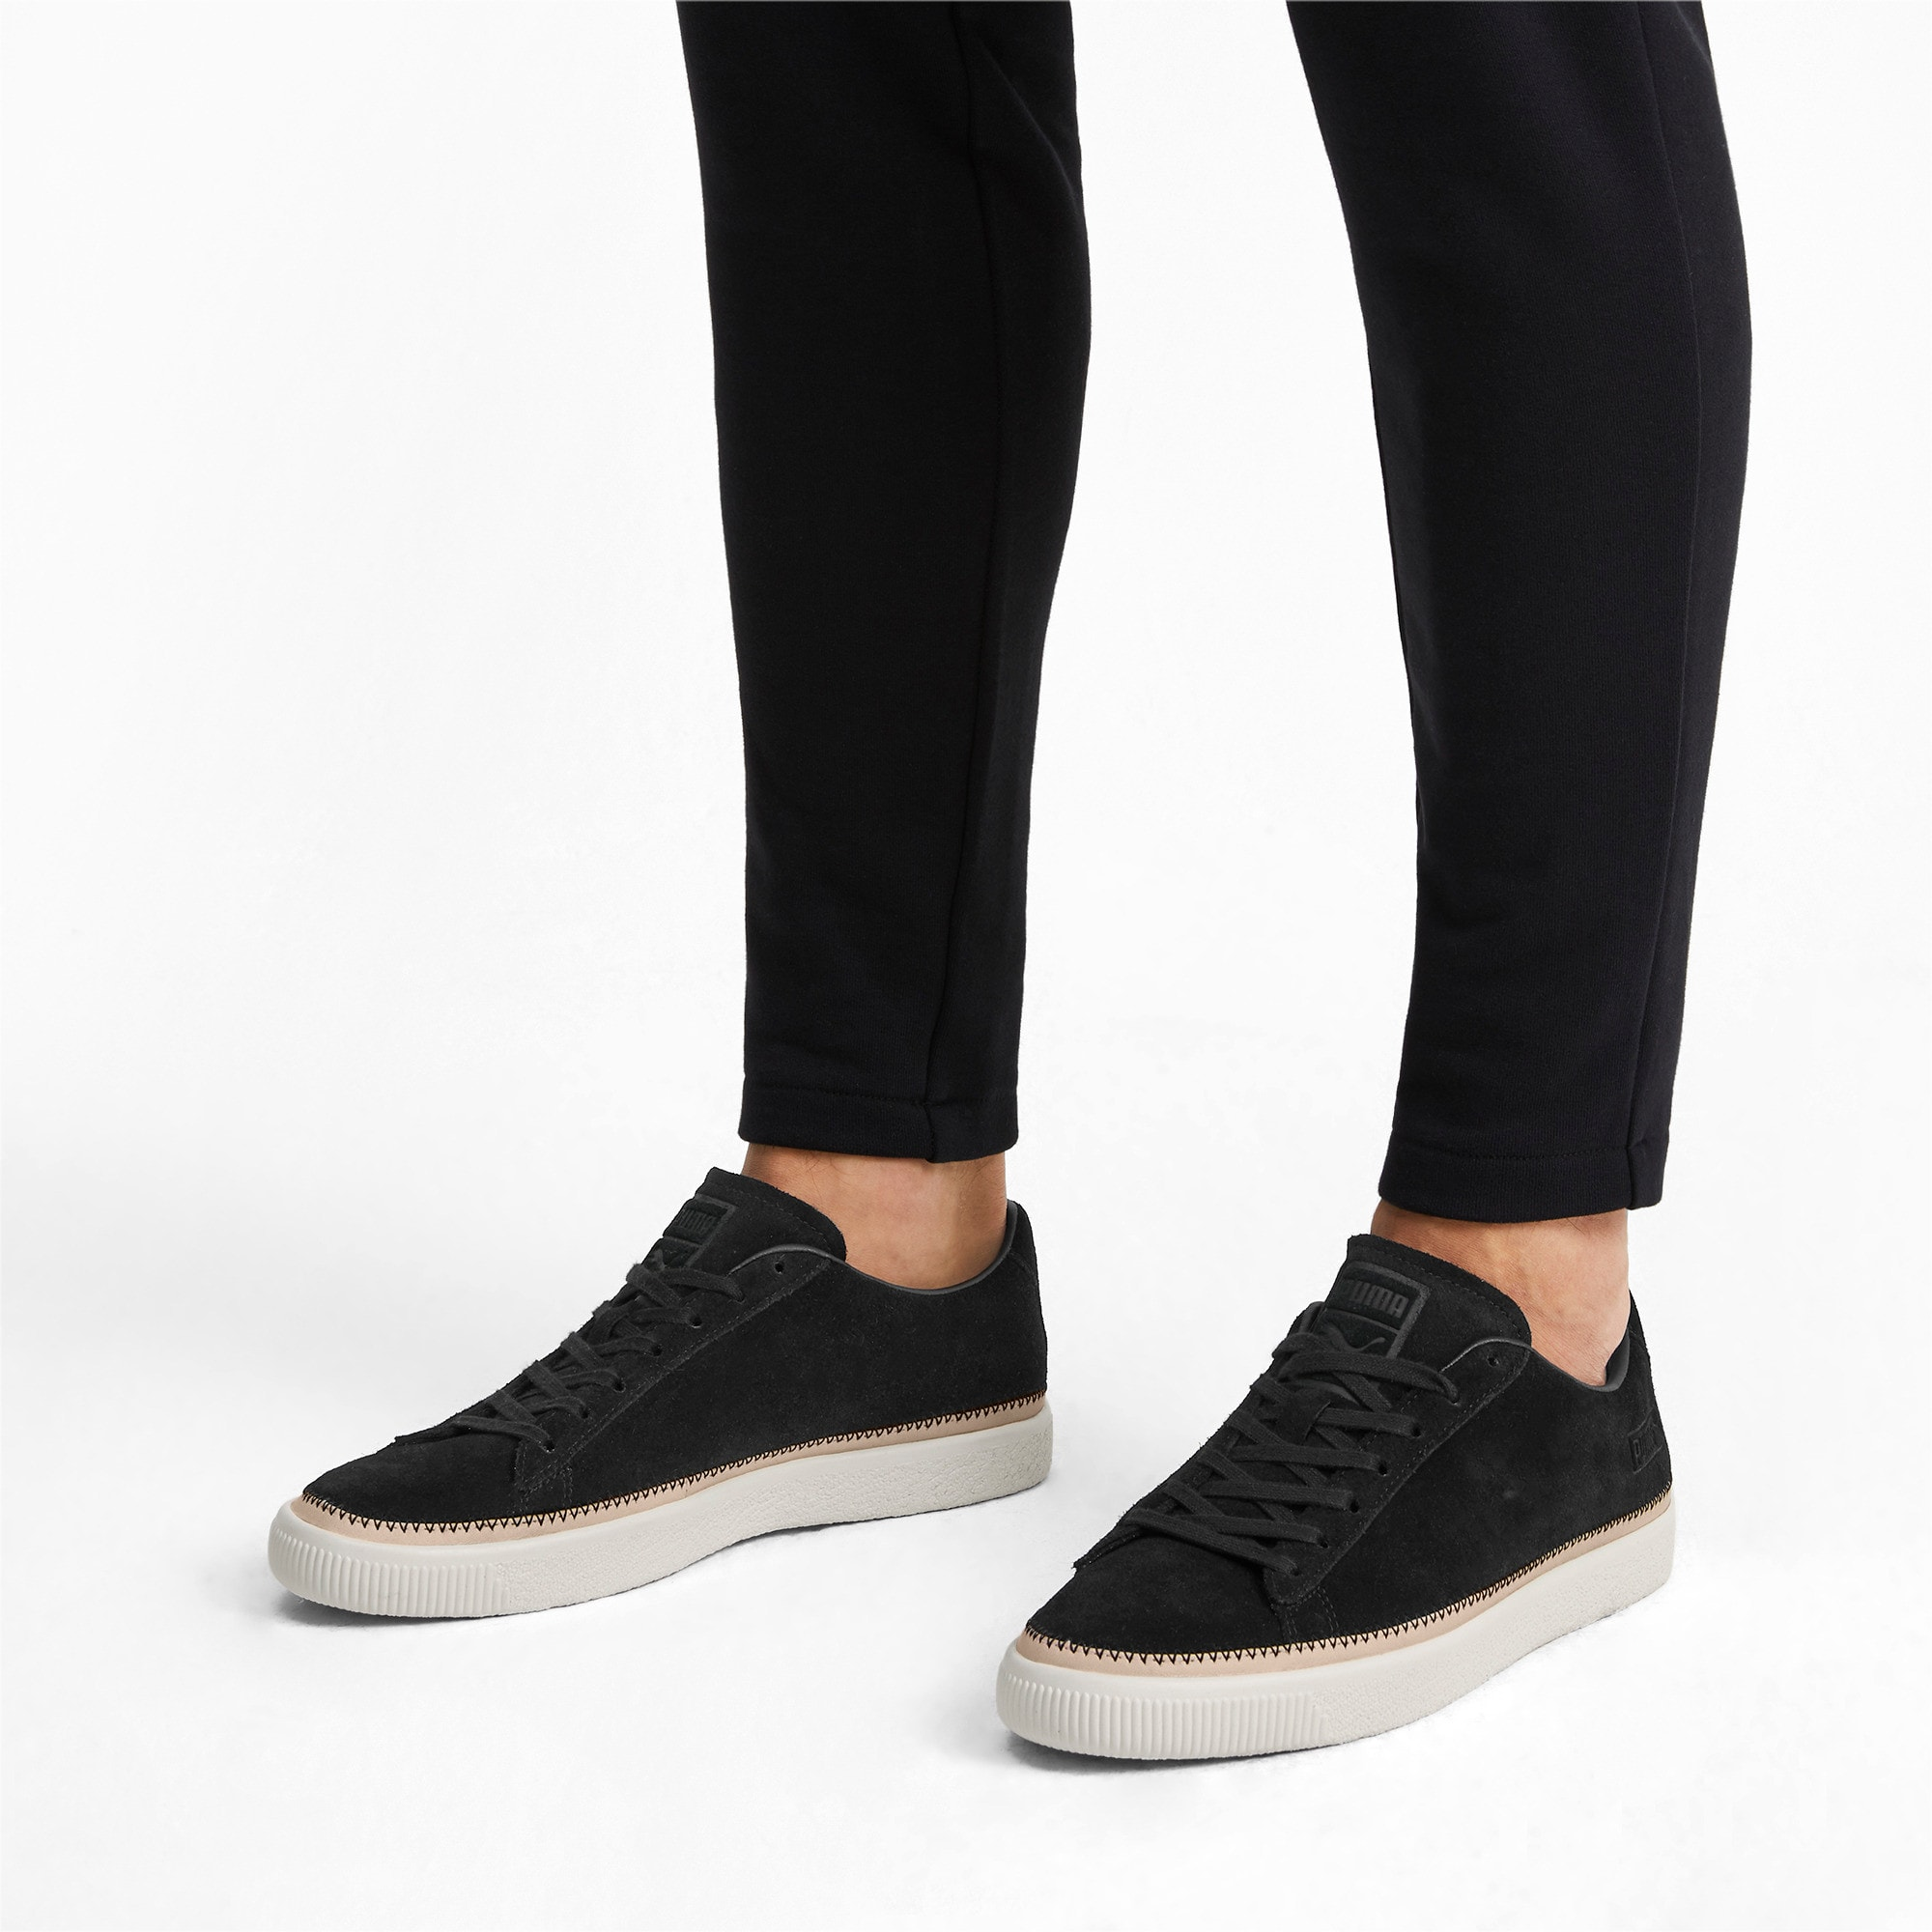 Thumbnail 2 of Suede Trim PRM Sneakers, Puma Black-Whisper White, medium